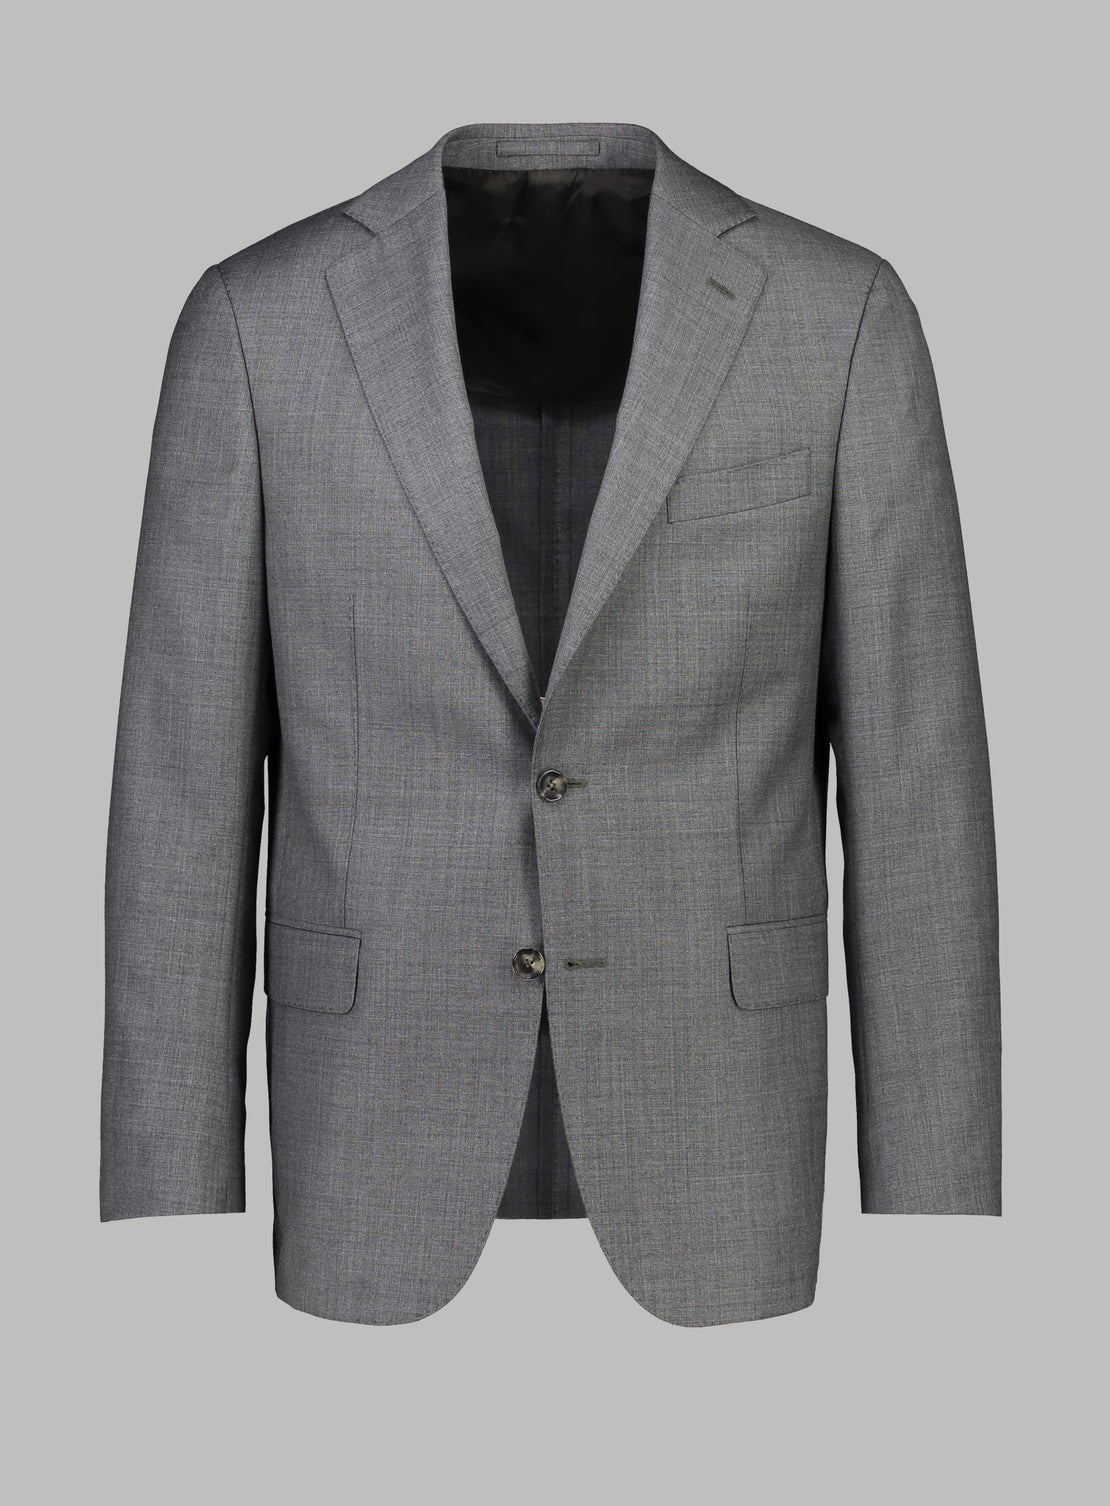 Britt Grey Twill Suit